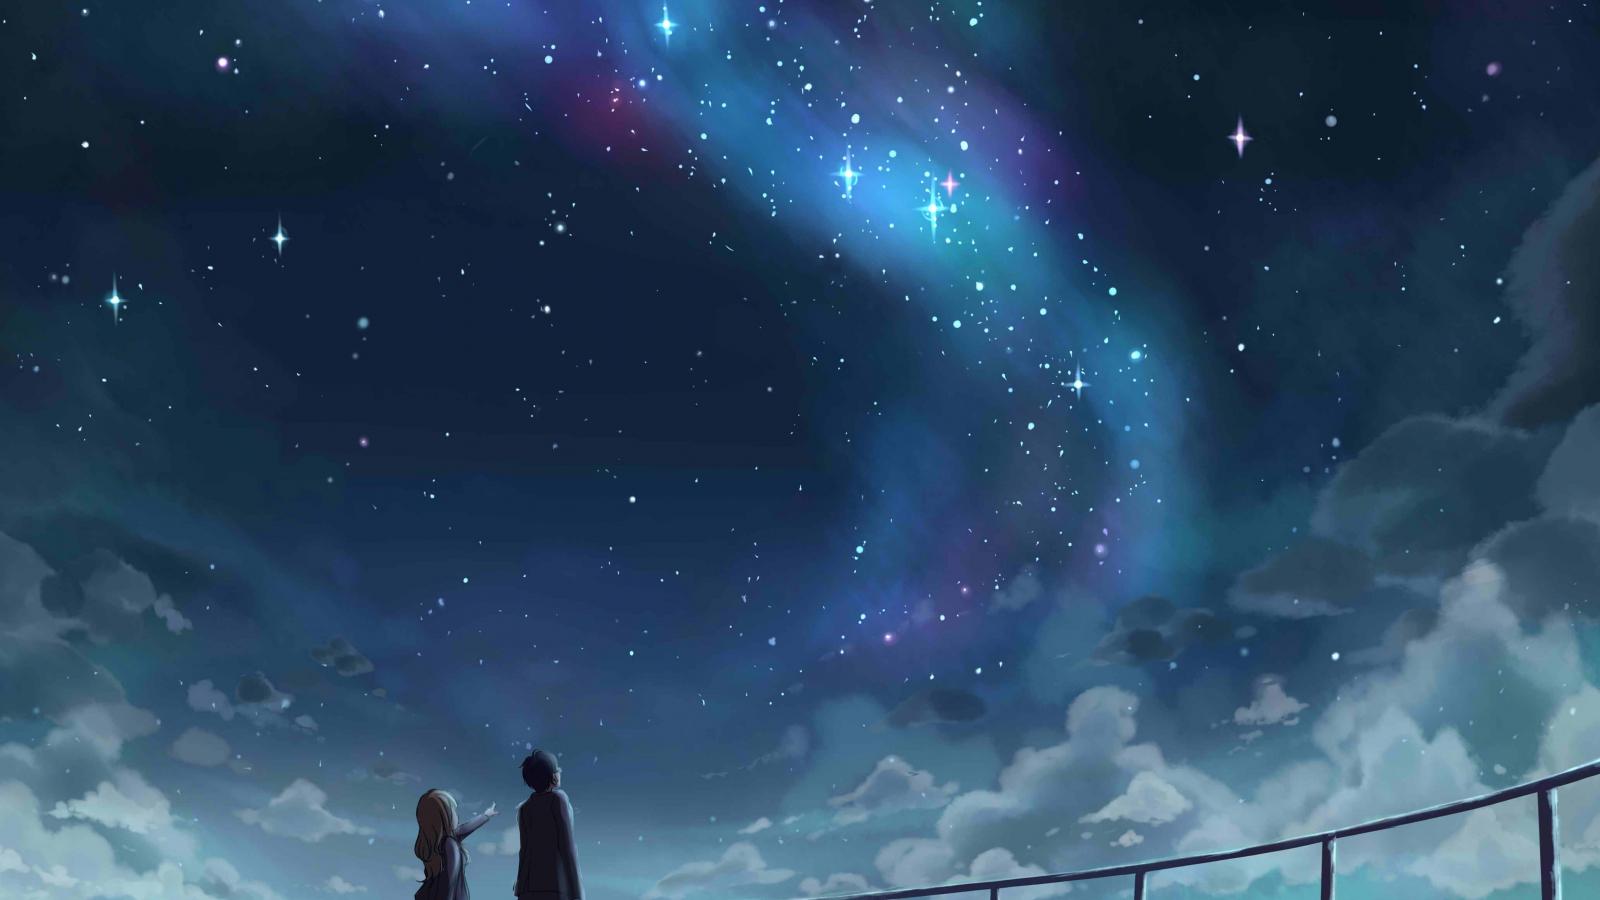 Free Download Aesthetic Anime Desktop Wallpapers Top Aesthetic